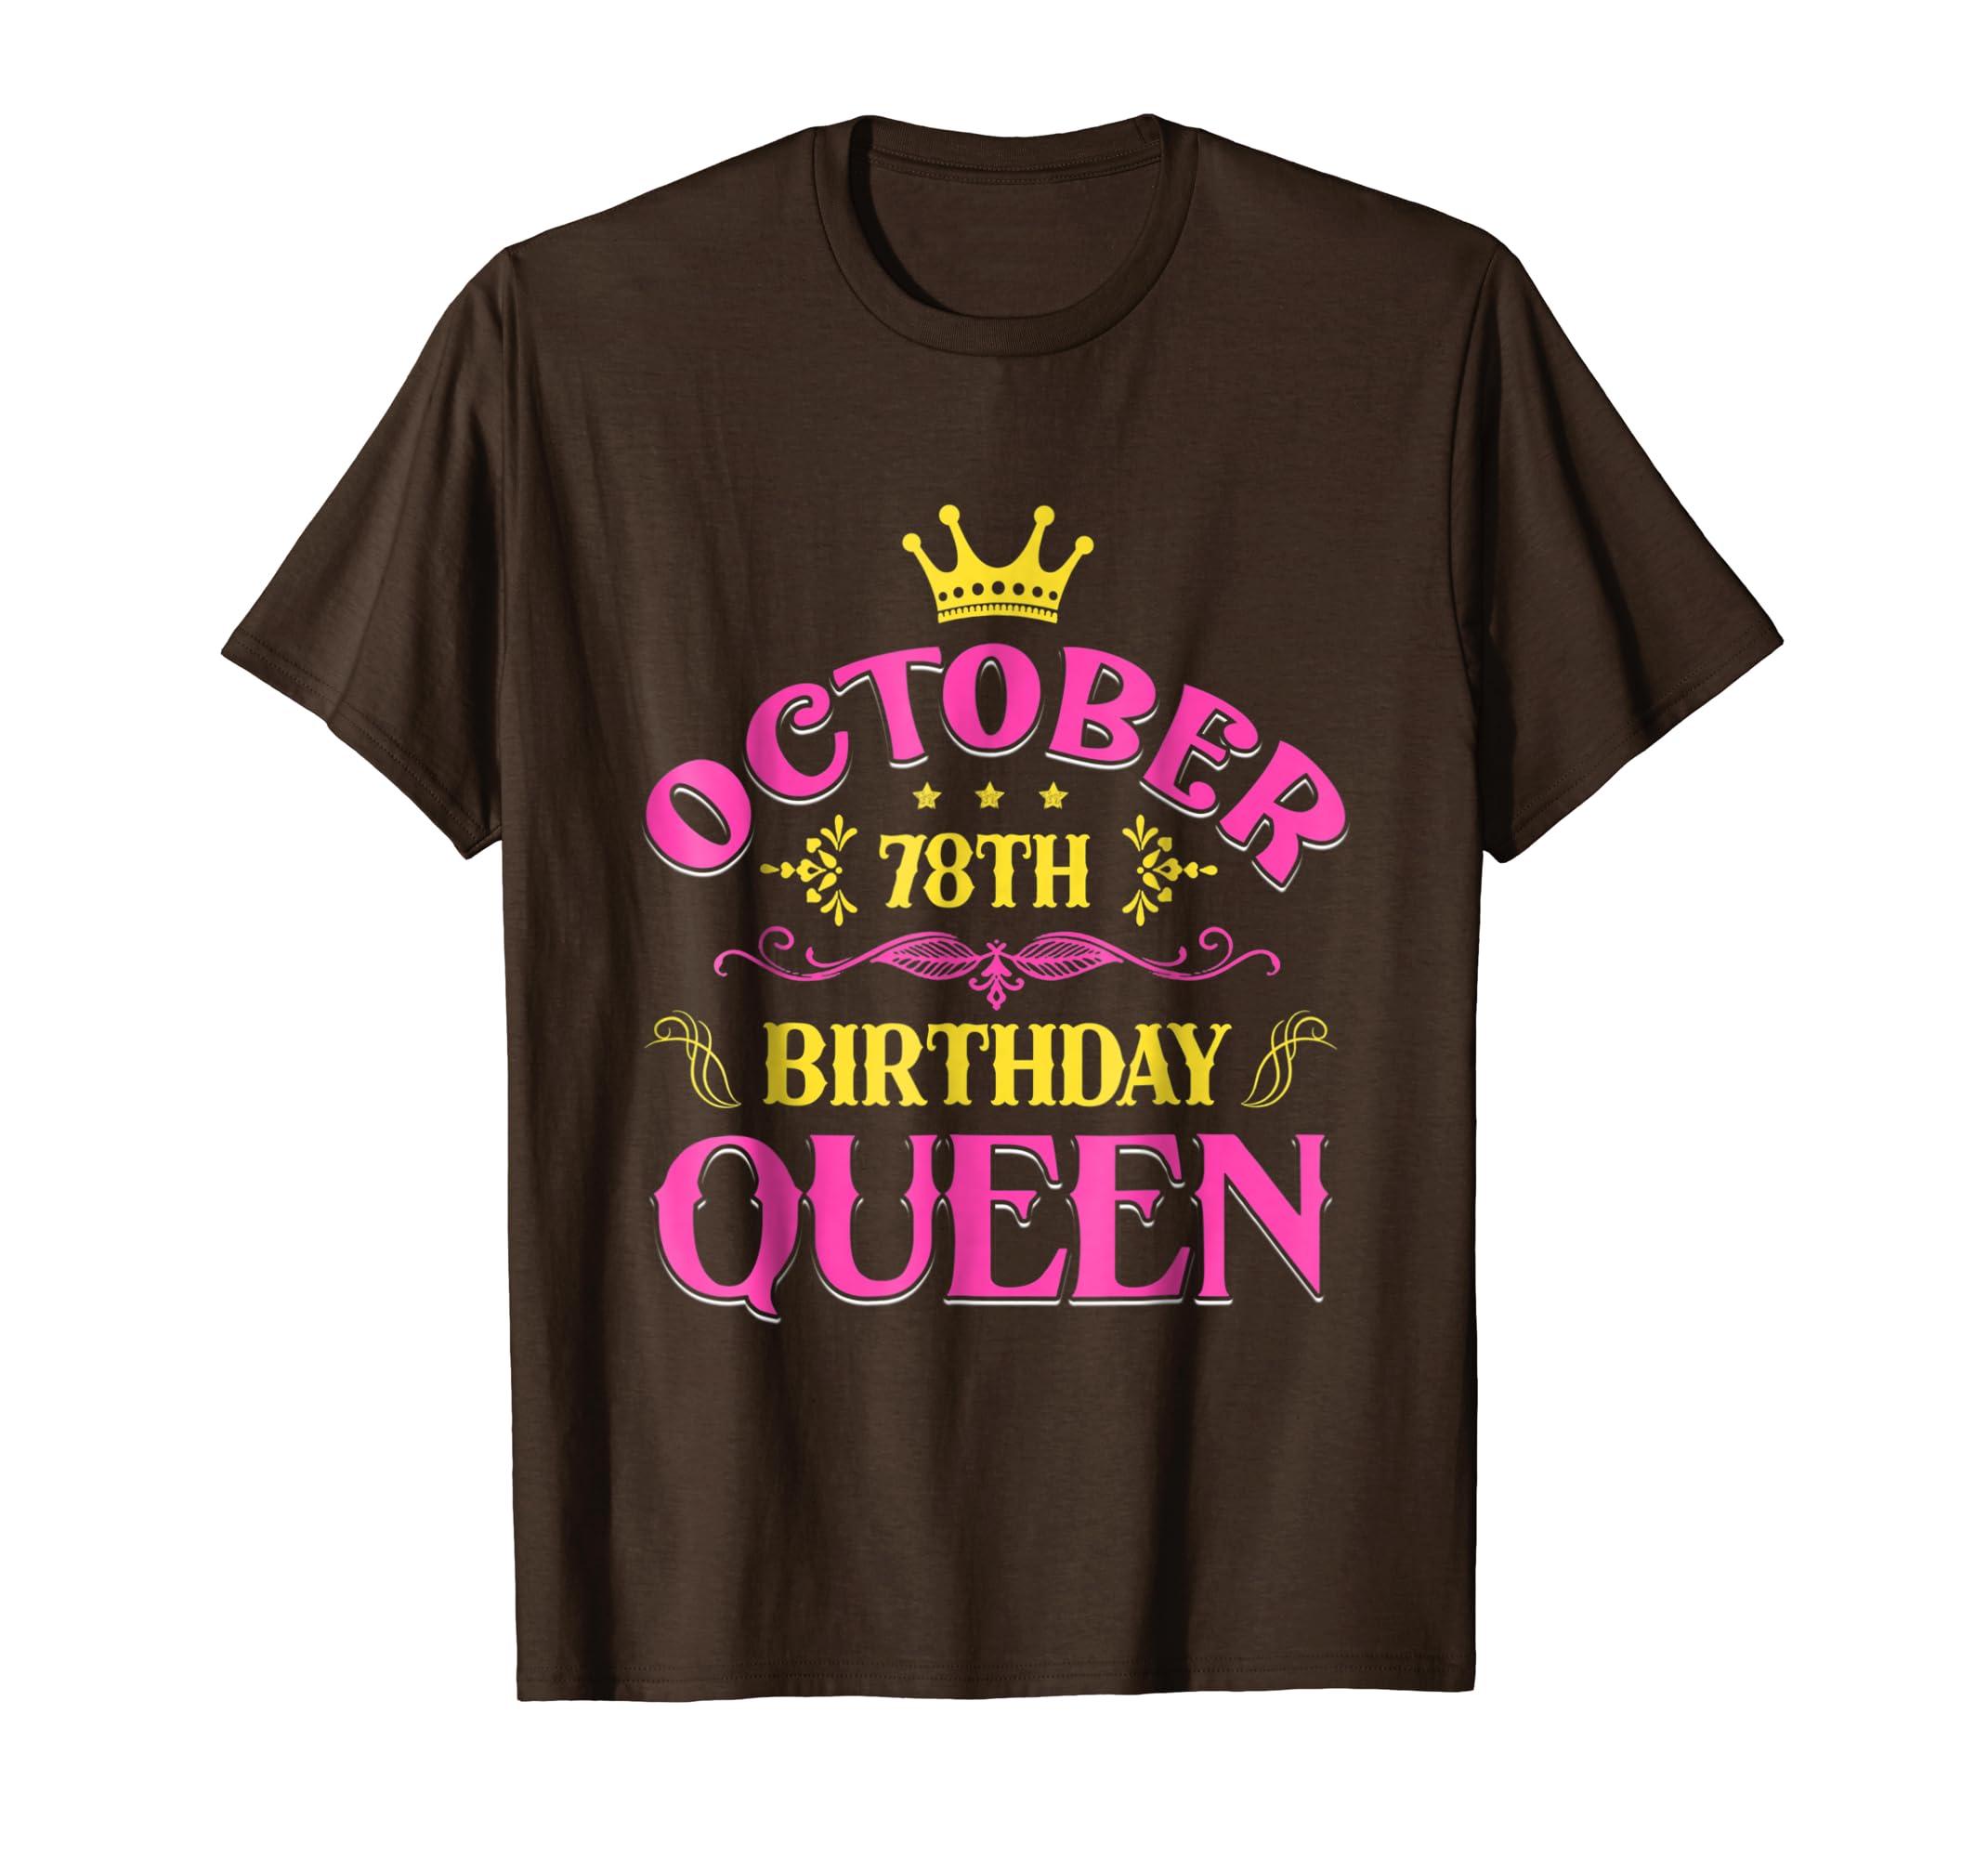 October 78th Birthday Queen Shirt Birthday Gift For Women-SFL